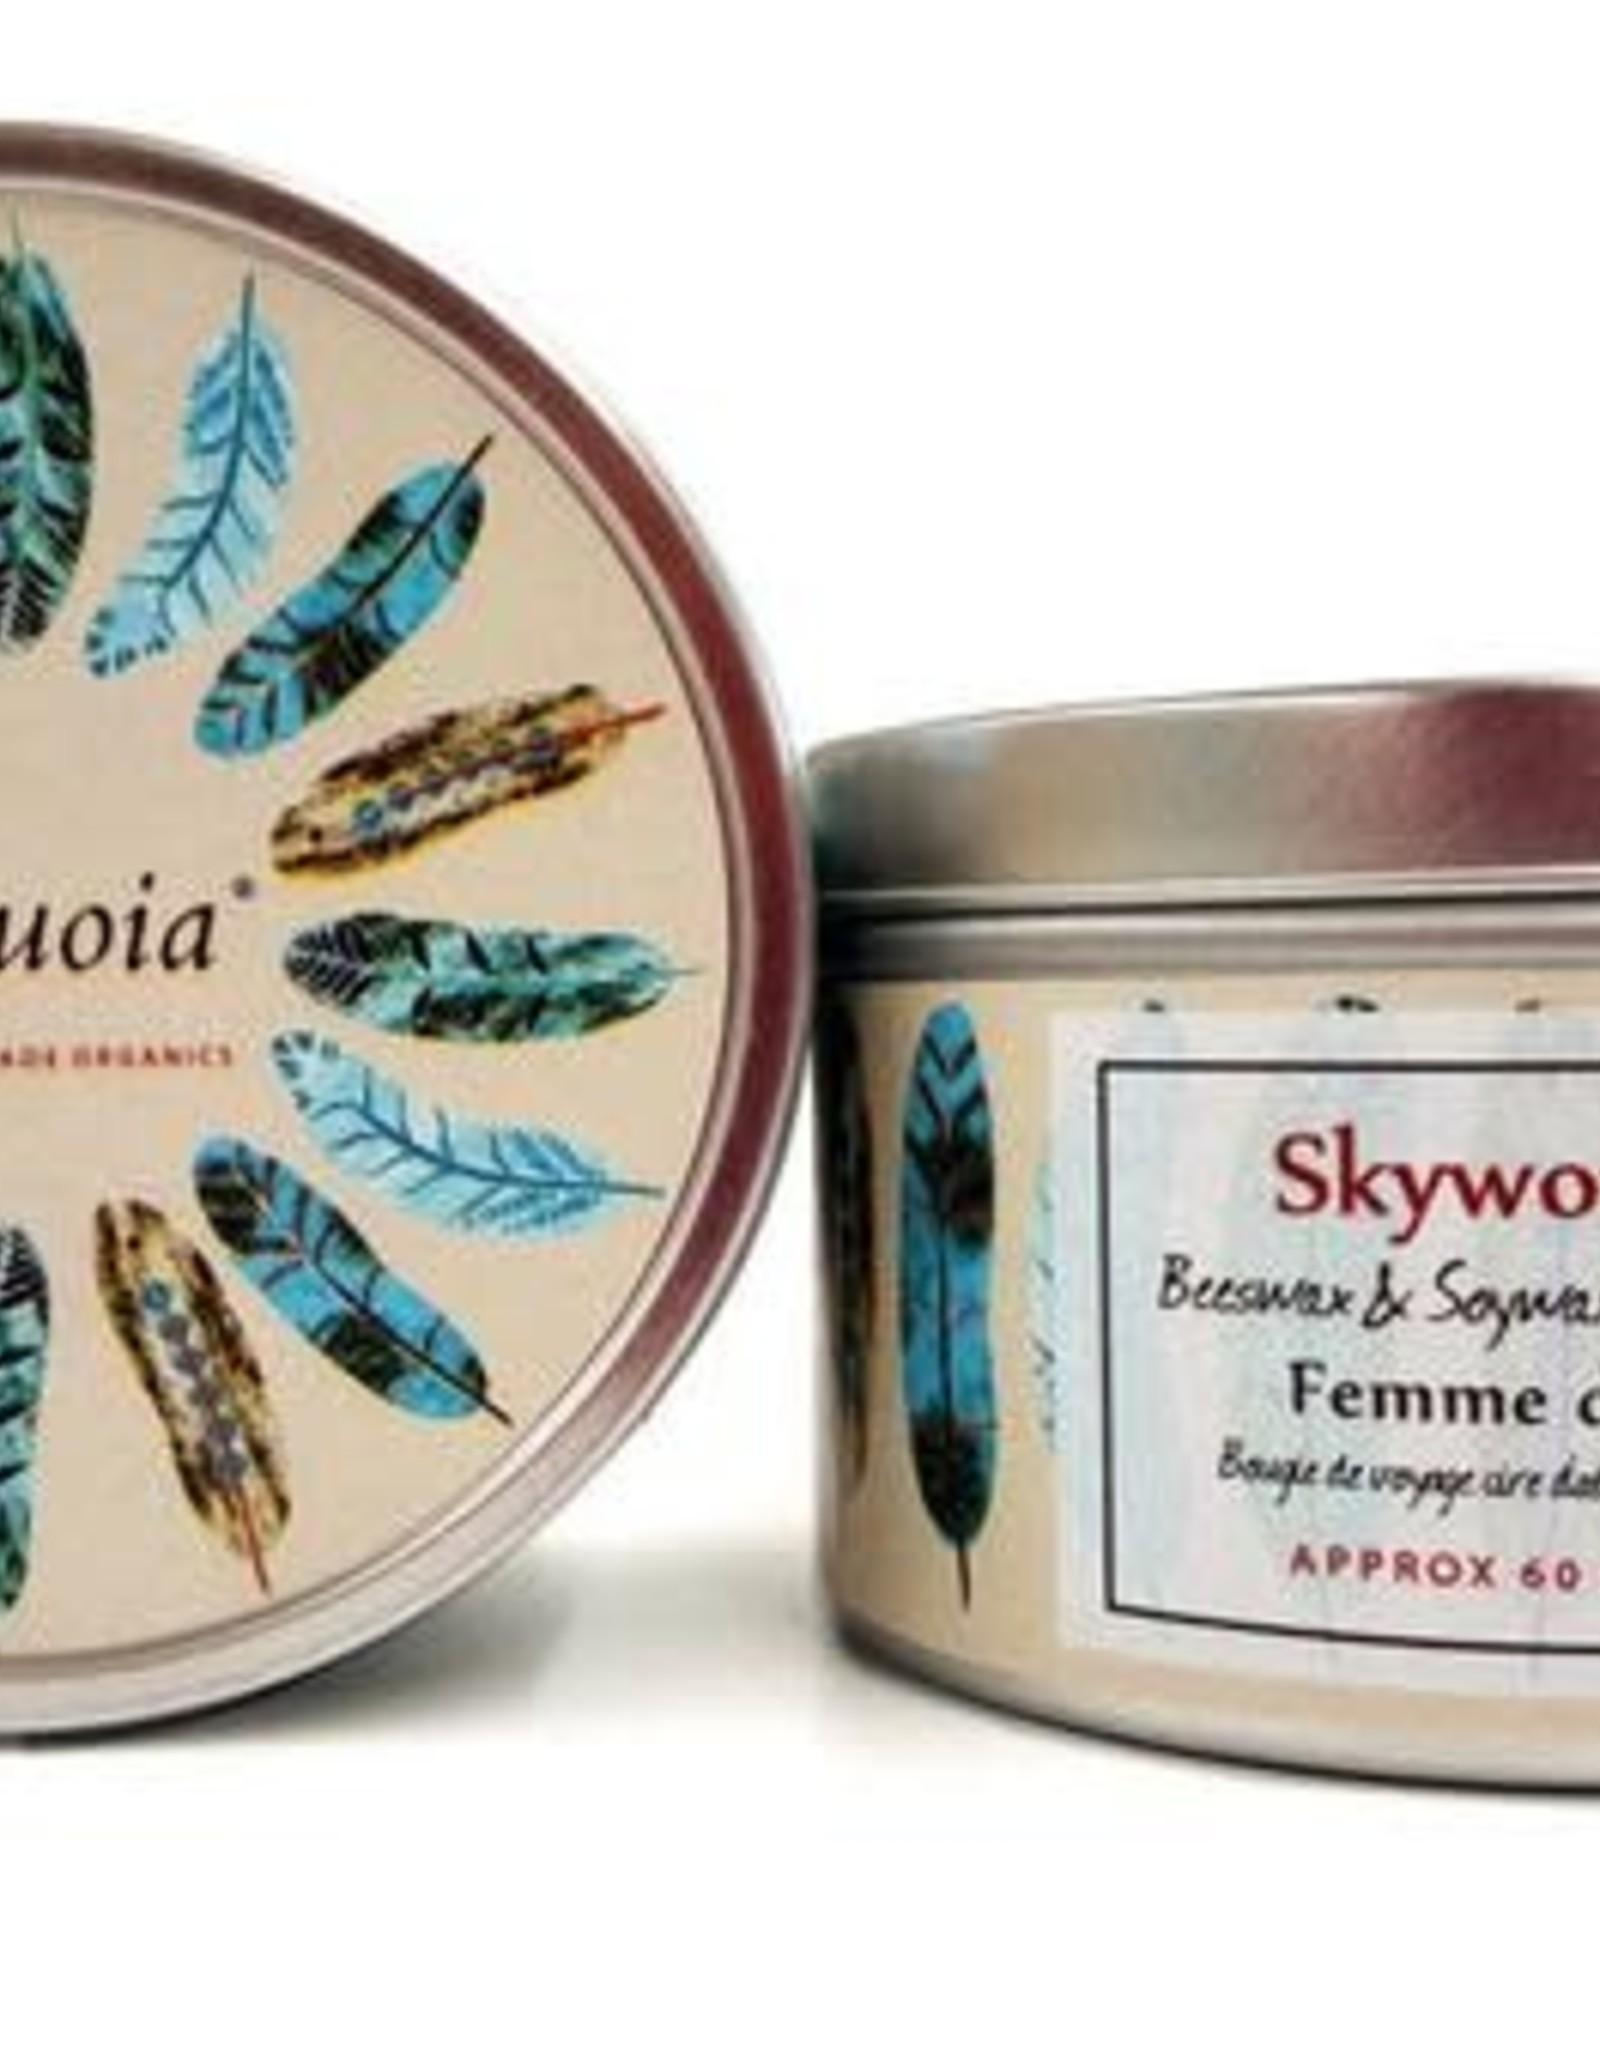 Sequoia 15 HR. Candle - Skywoman